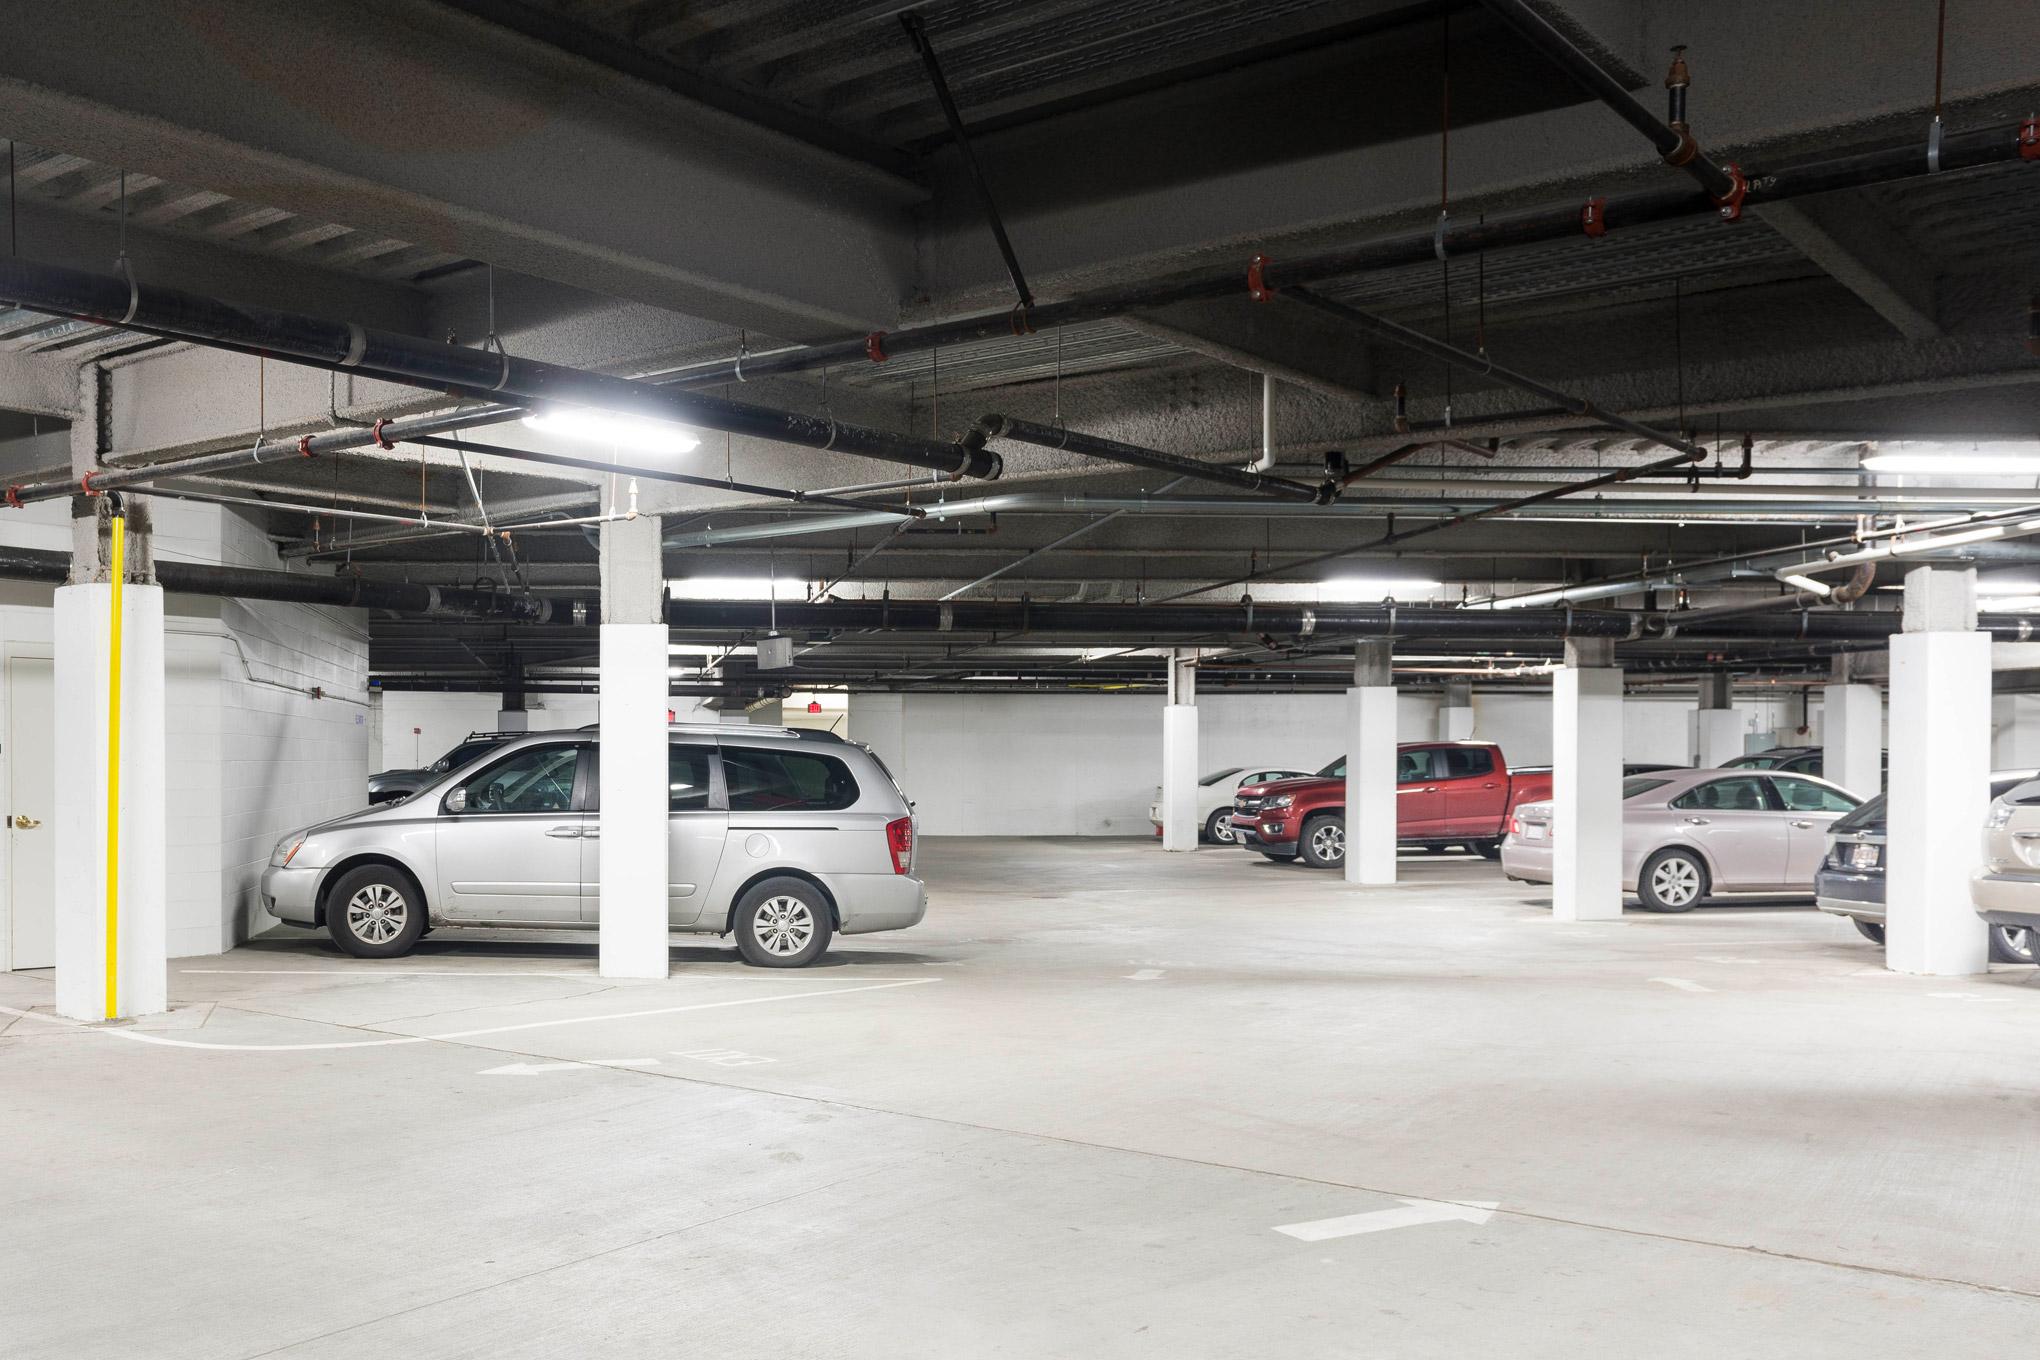 apartment-parking.jpg